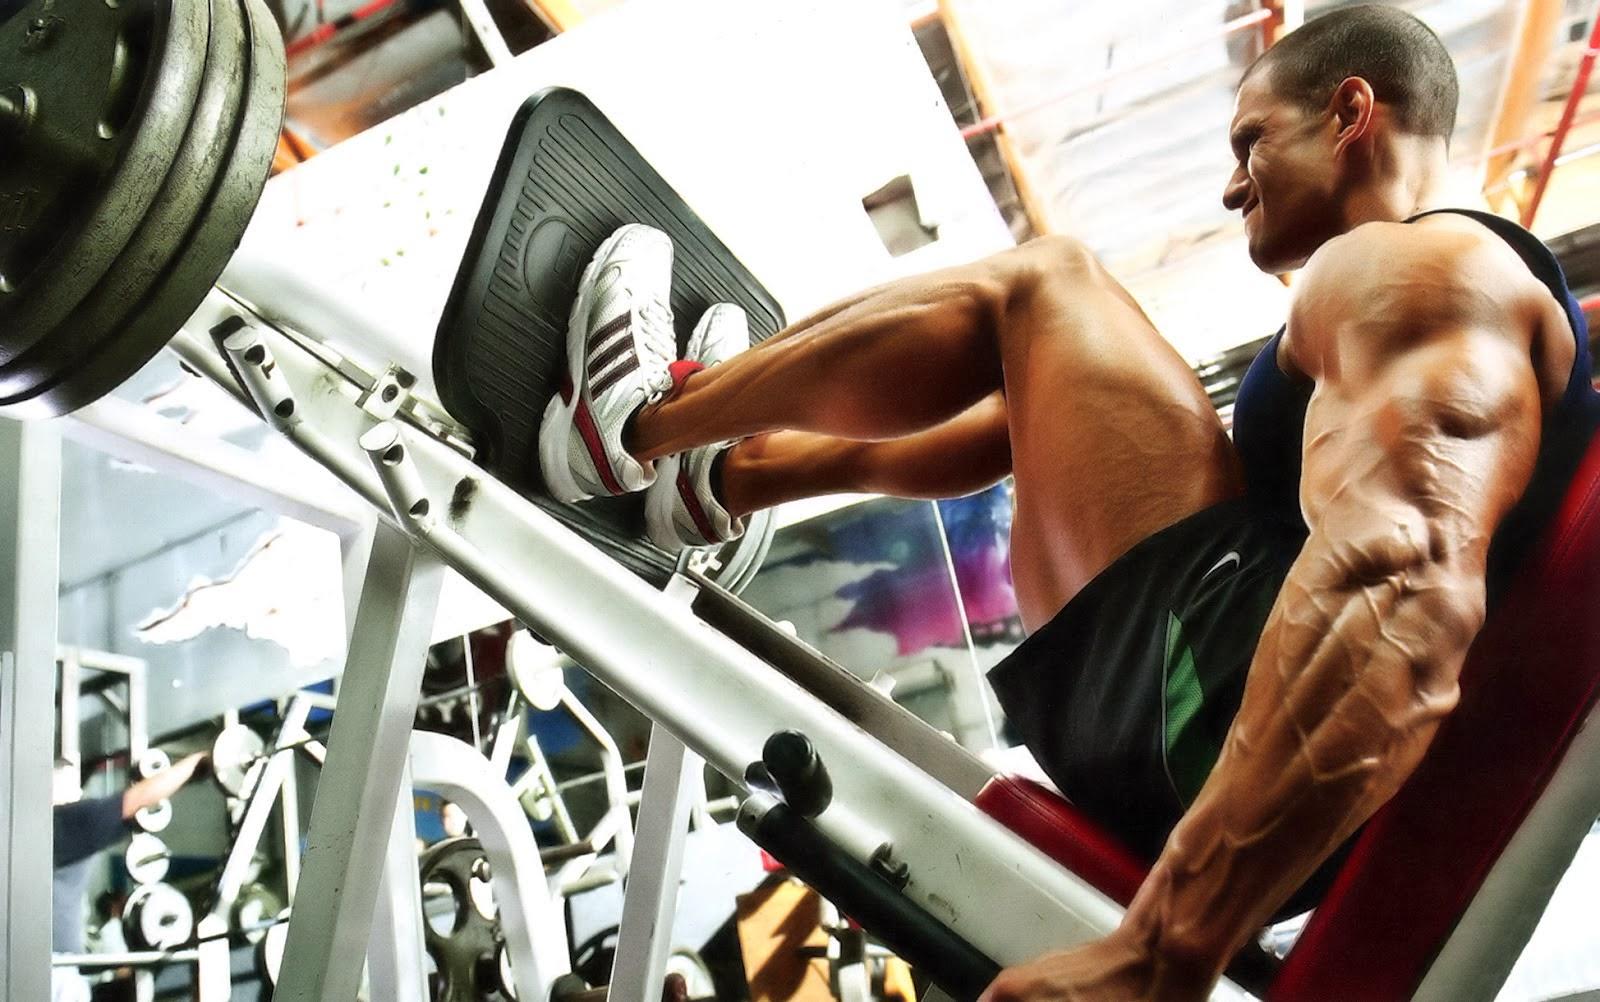 Como acelerar o crescimento muscular